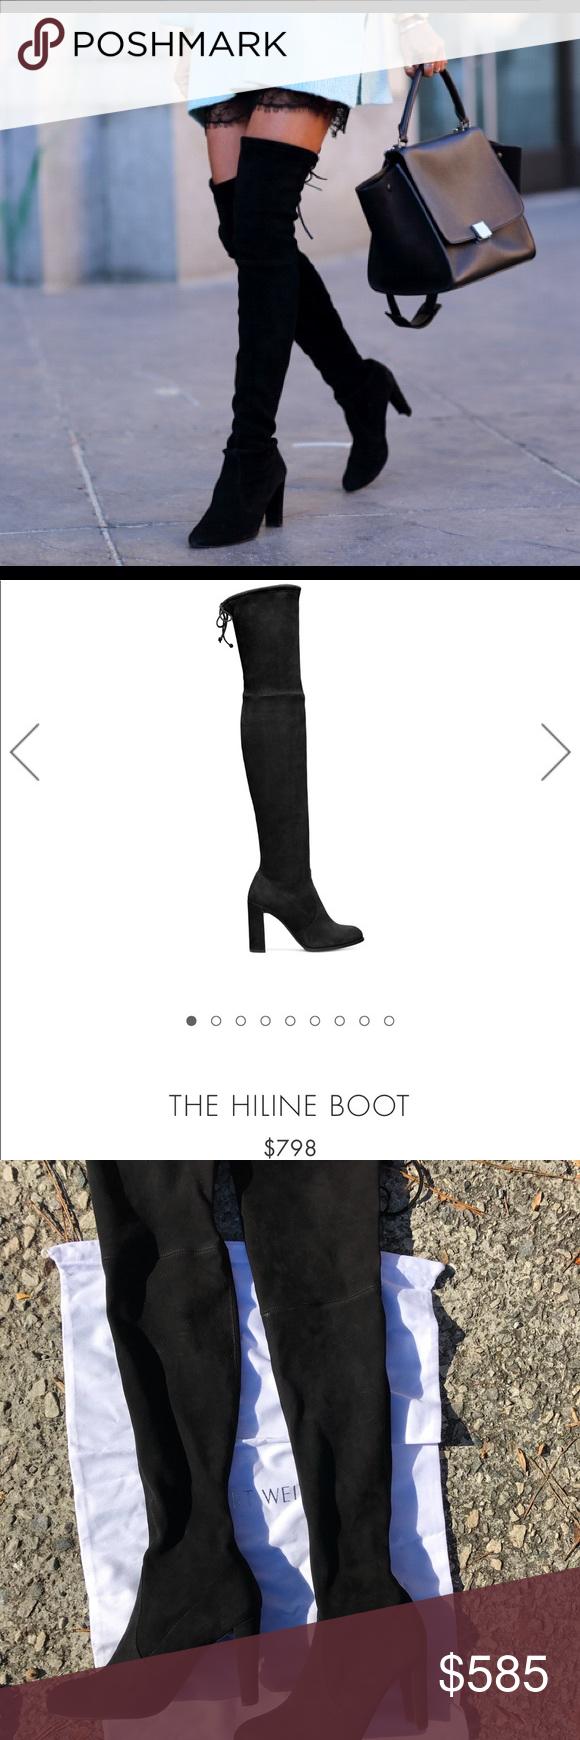 3fdb2e3f770 stuart weitzman boots BRAND NEW stuart weitzman highland black Open to  offers